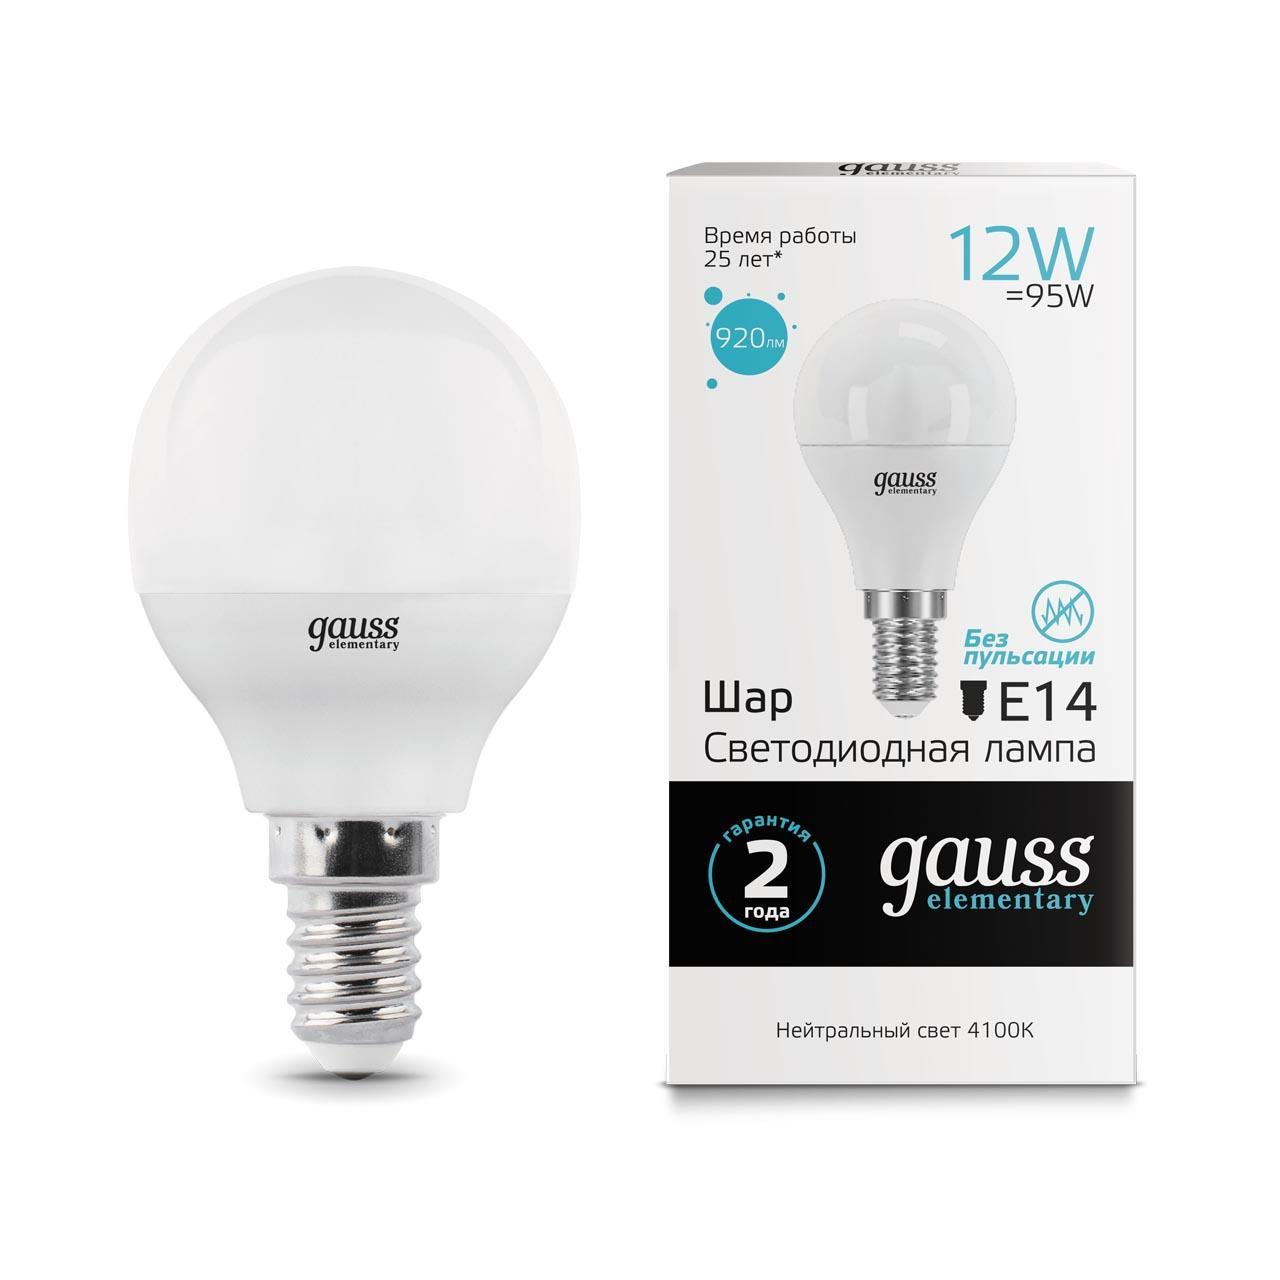 Лампа светодиодная E14 12W 4100K матовая 53122 goodeck лампа светодиодная goodeck рефлекторная матовая gu10 5 5w 4100k gl1007024206